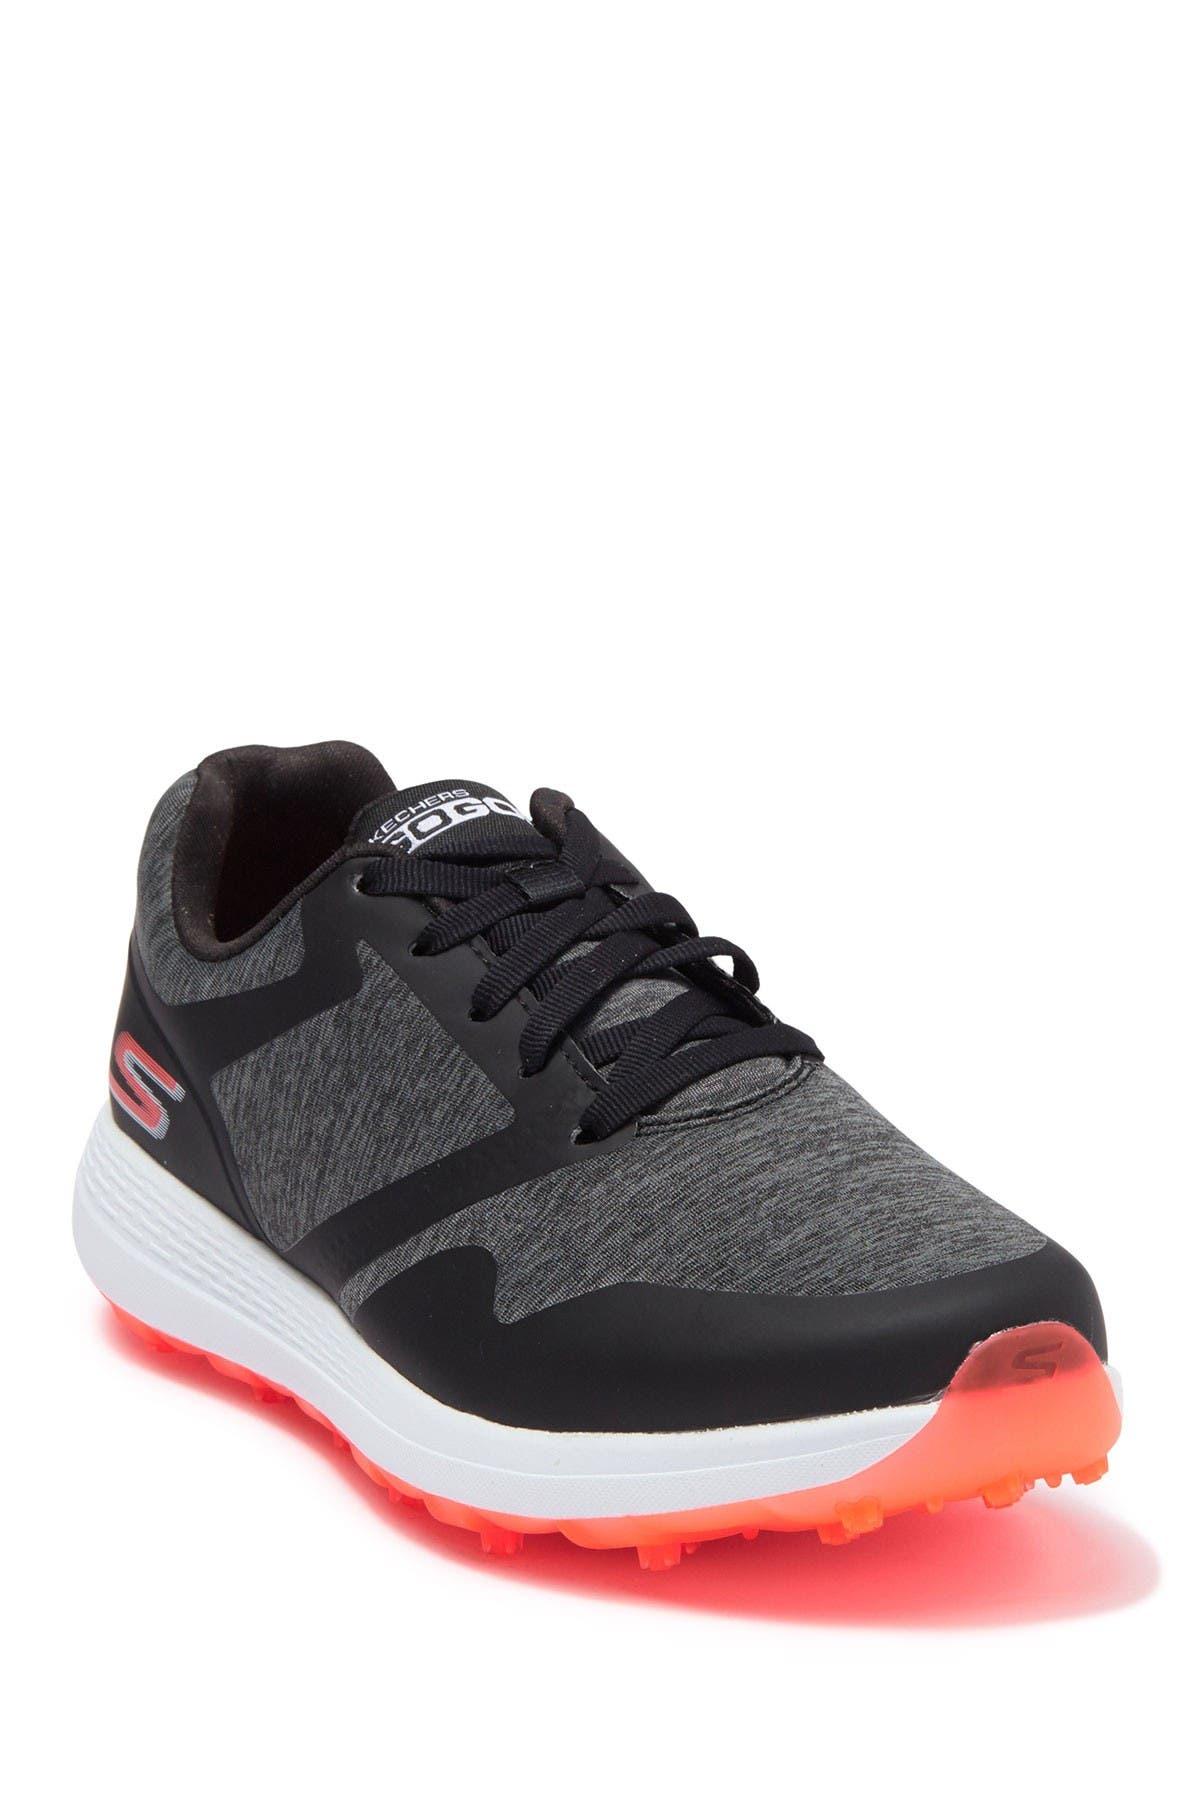 Image of Skechers Max Cut Golf Shoe